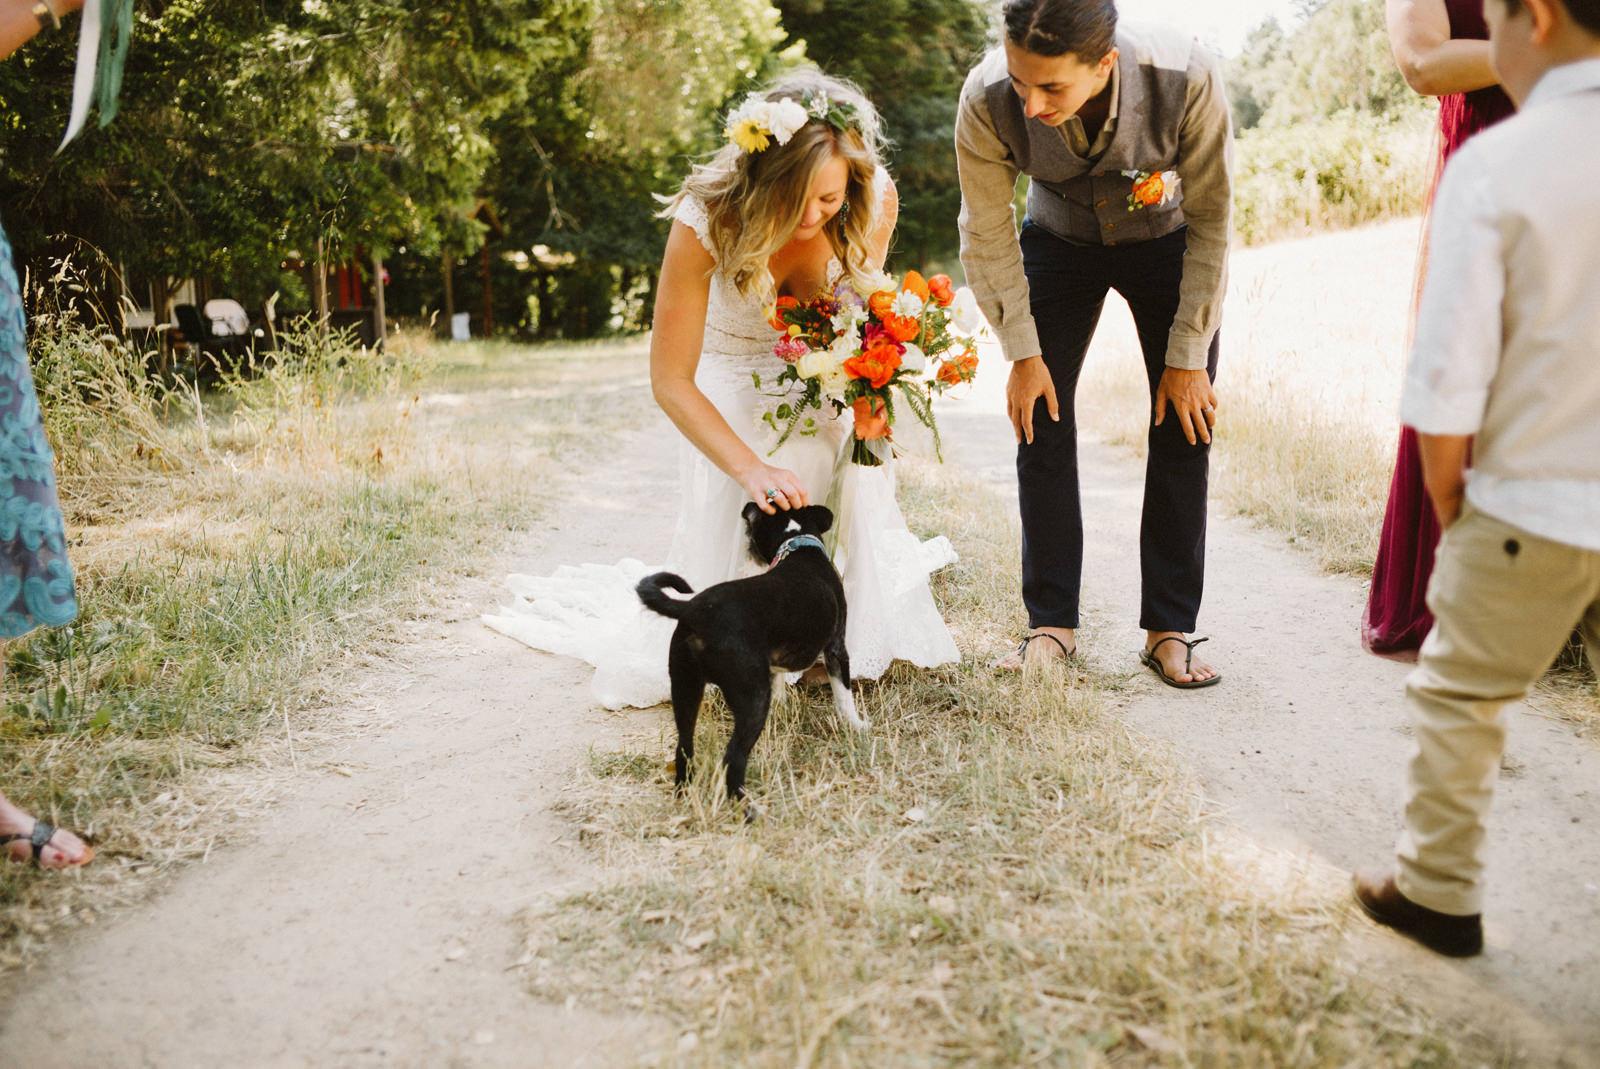 rivers-bend-retreat-wedding-046 RIVER'S BEND RETREAT WEDDING